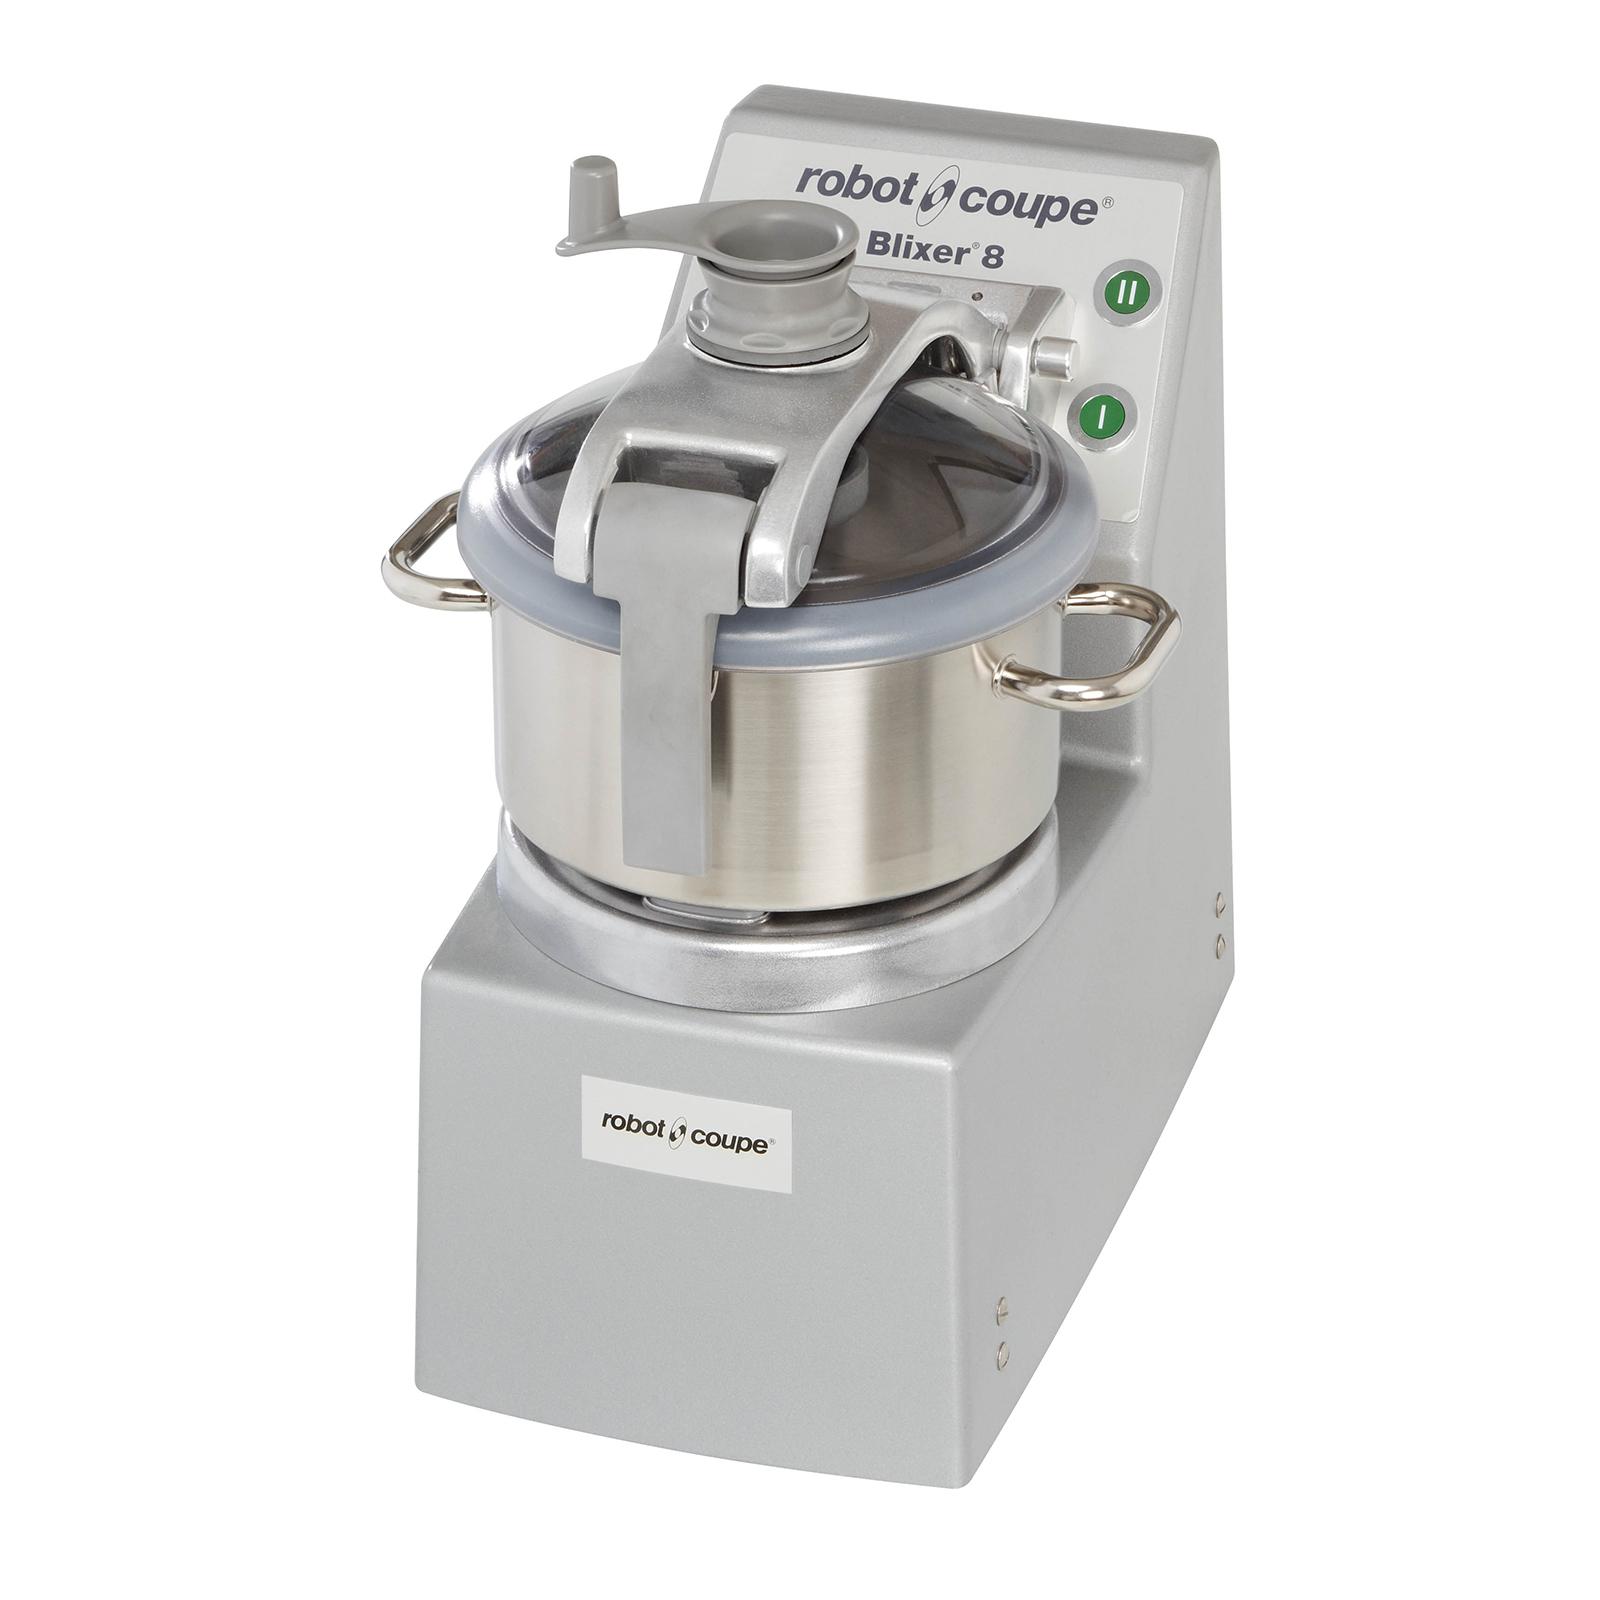 Robot Coupe BLIXER 8 food processor, benchtop / countertop